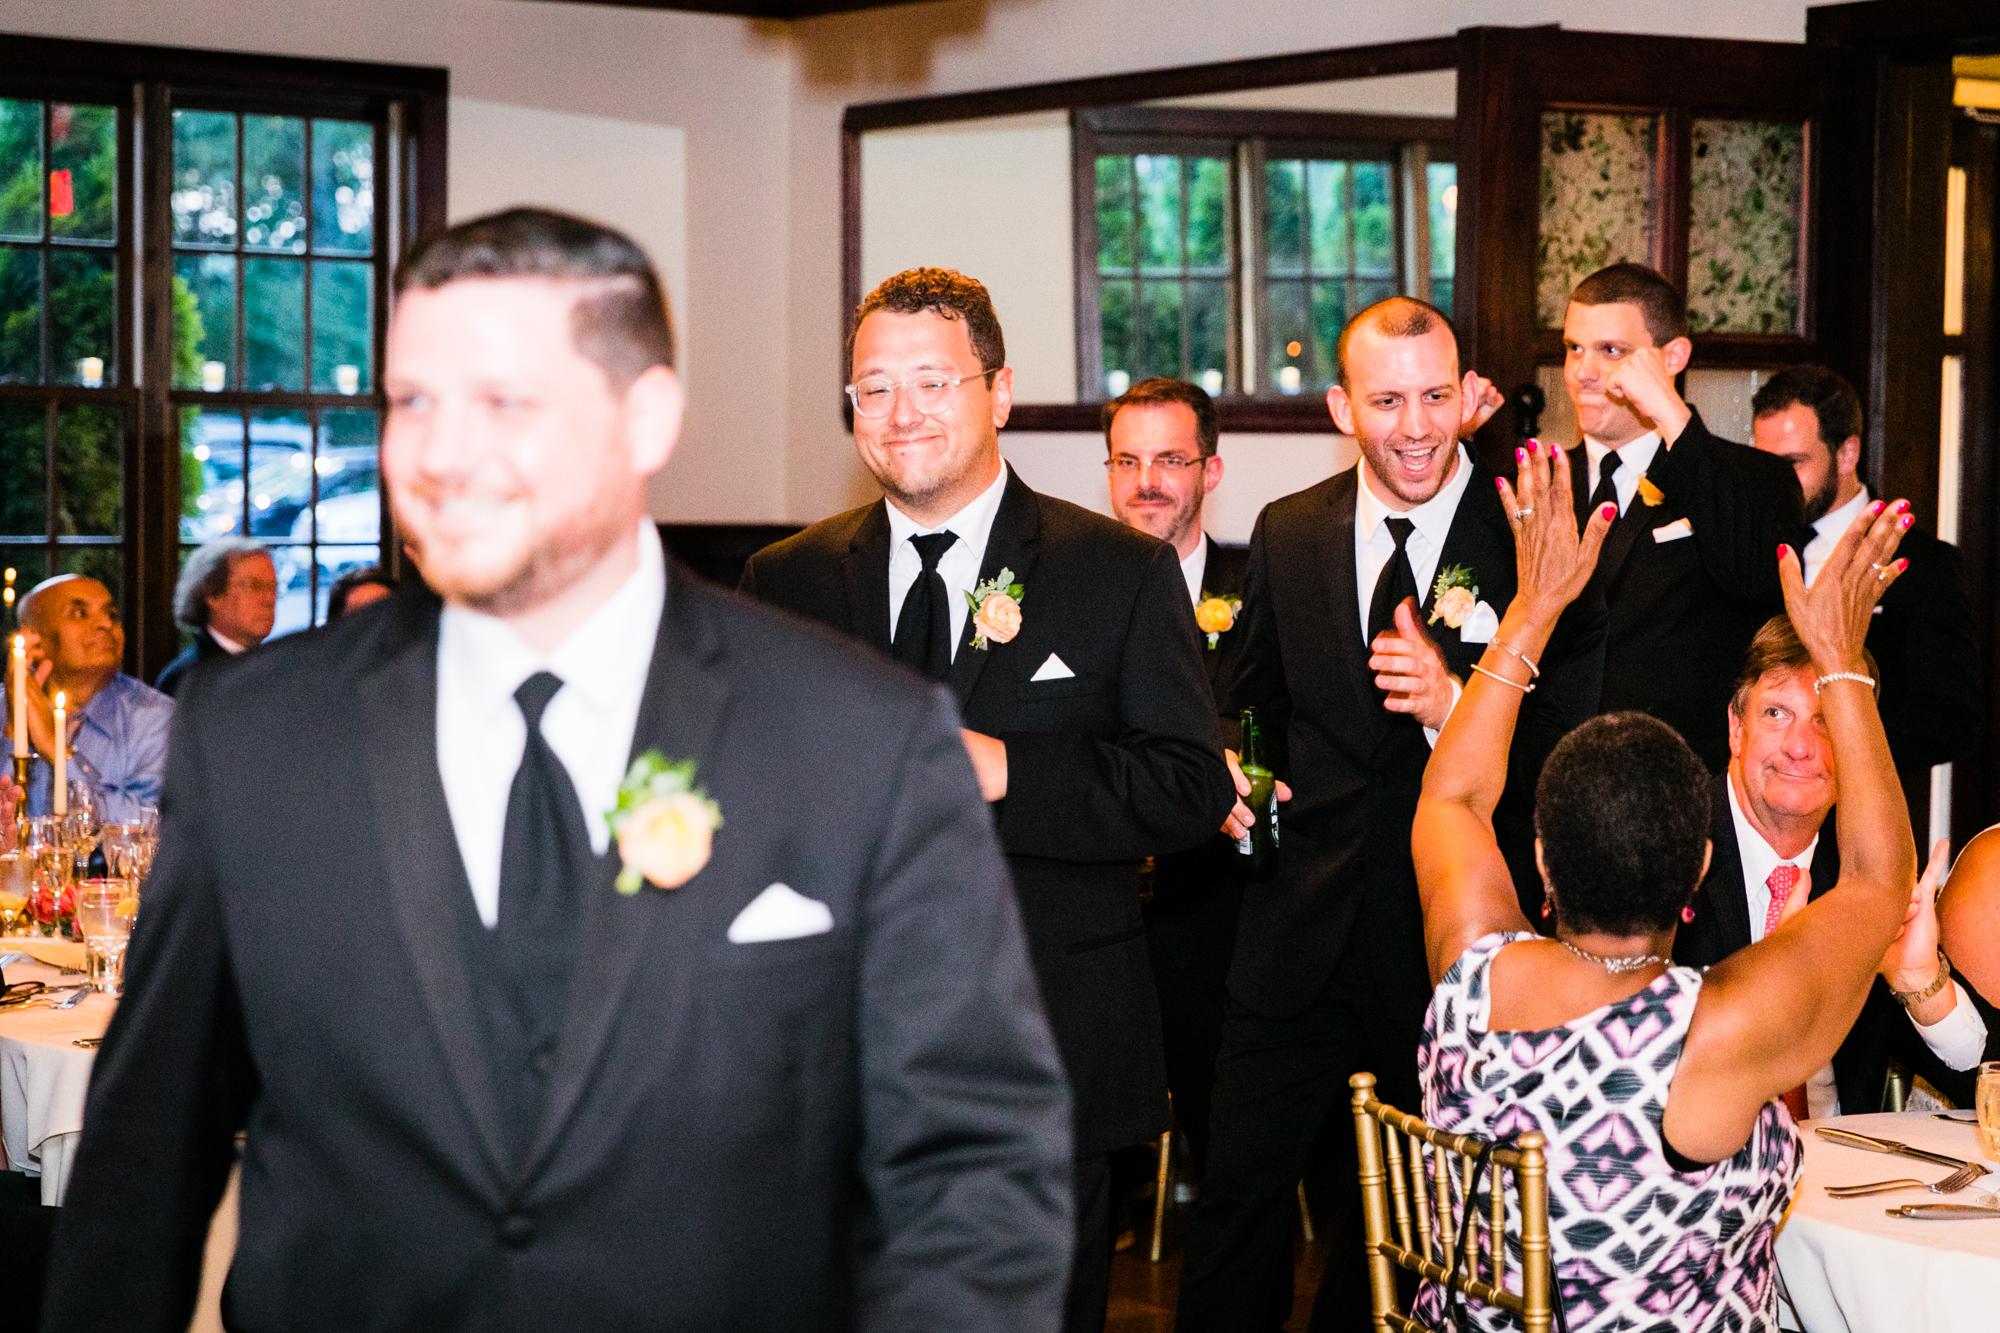 Hotel Du Village - LoveStruck Pictures - Wedding Photography-081.jpg